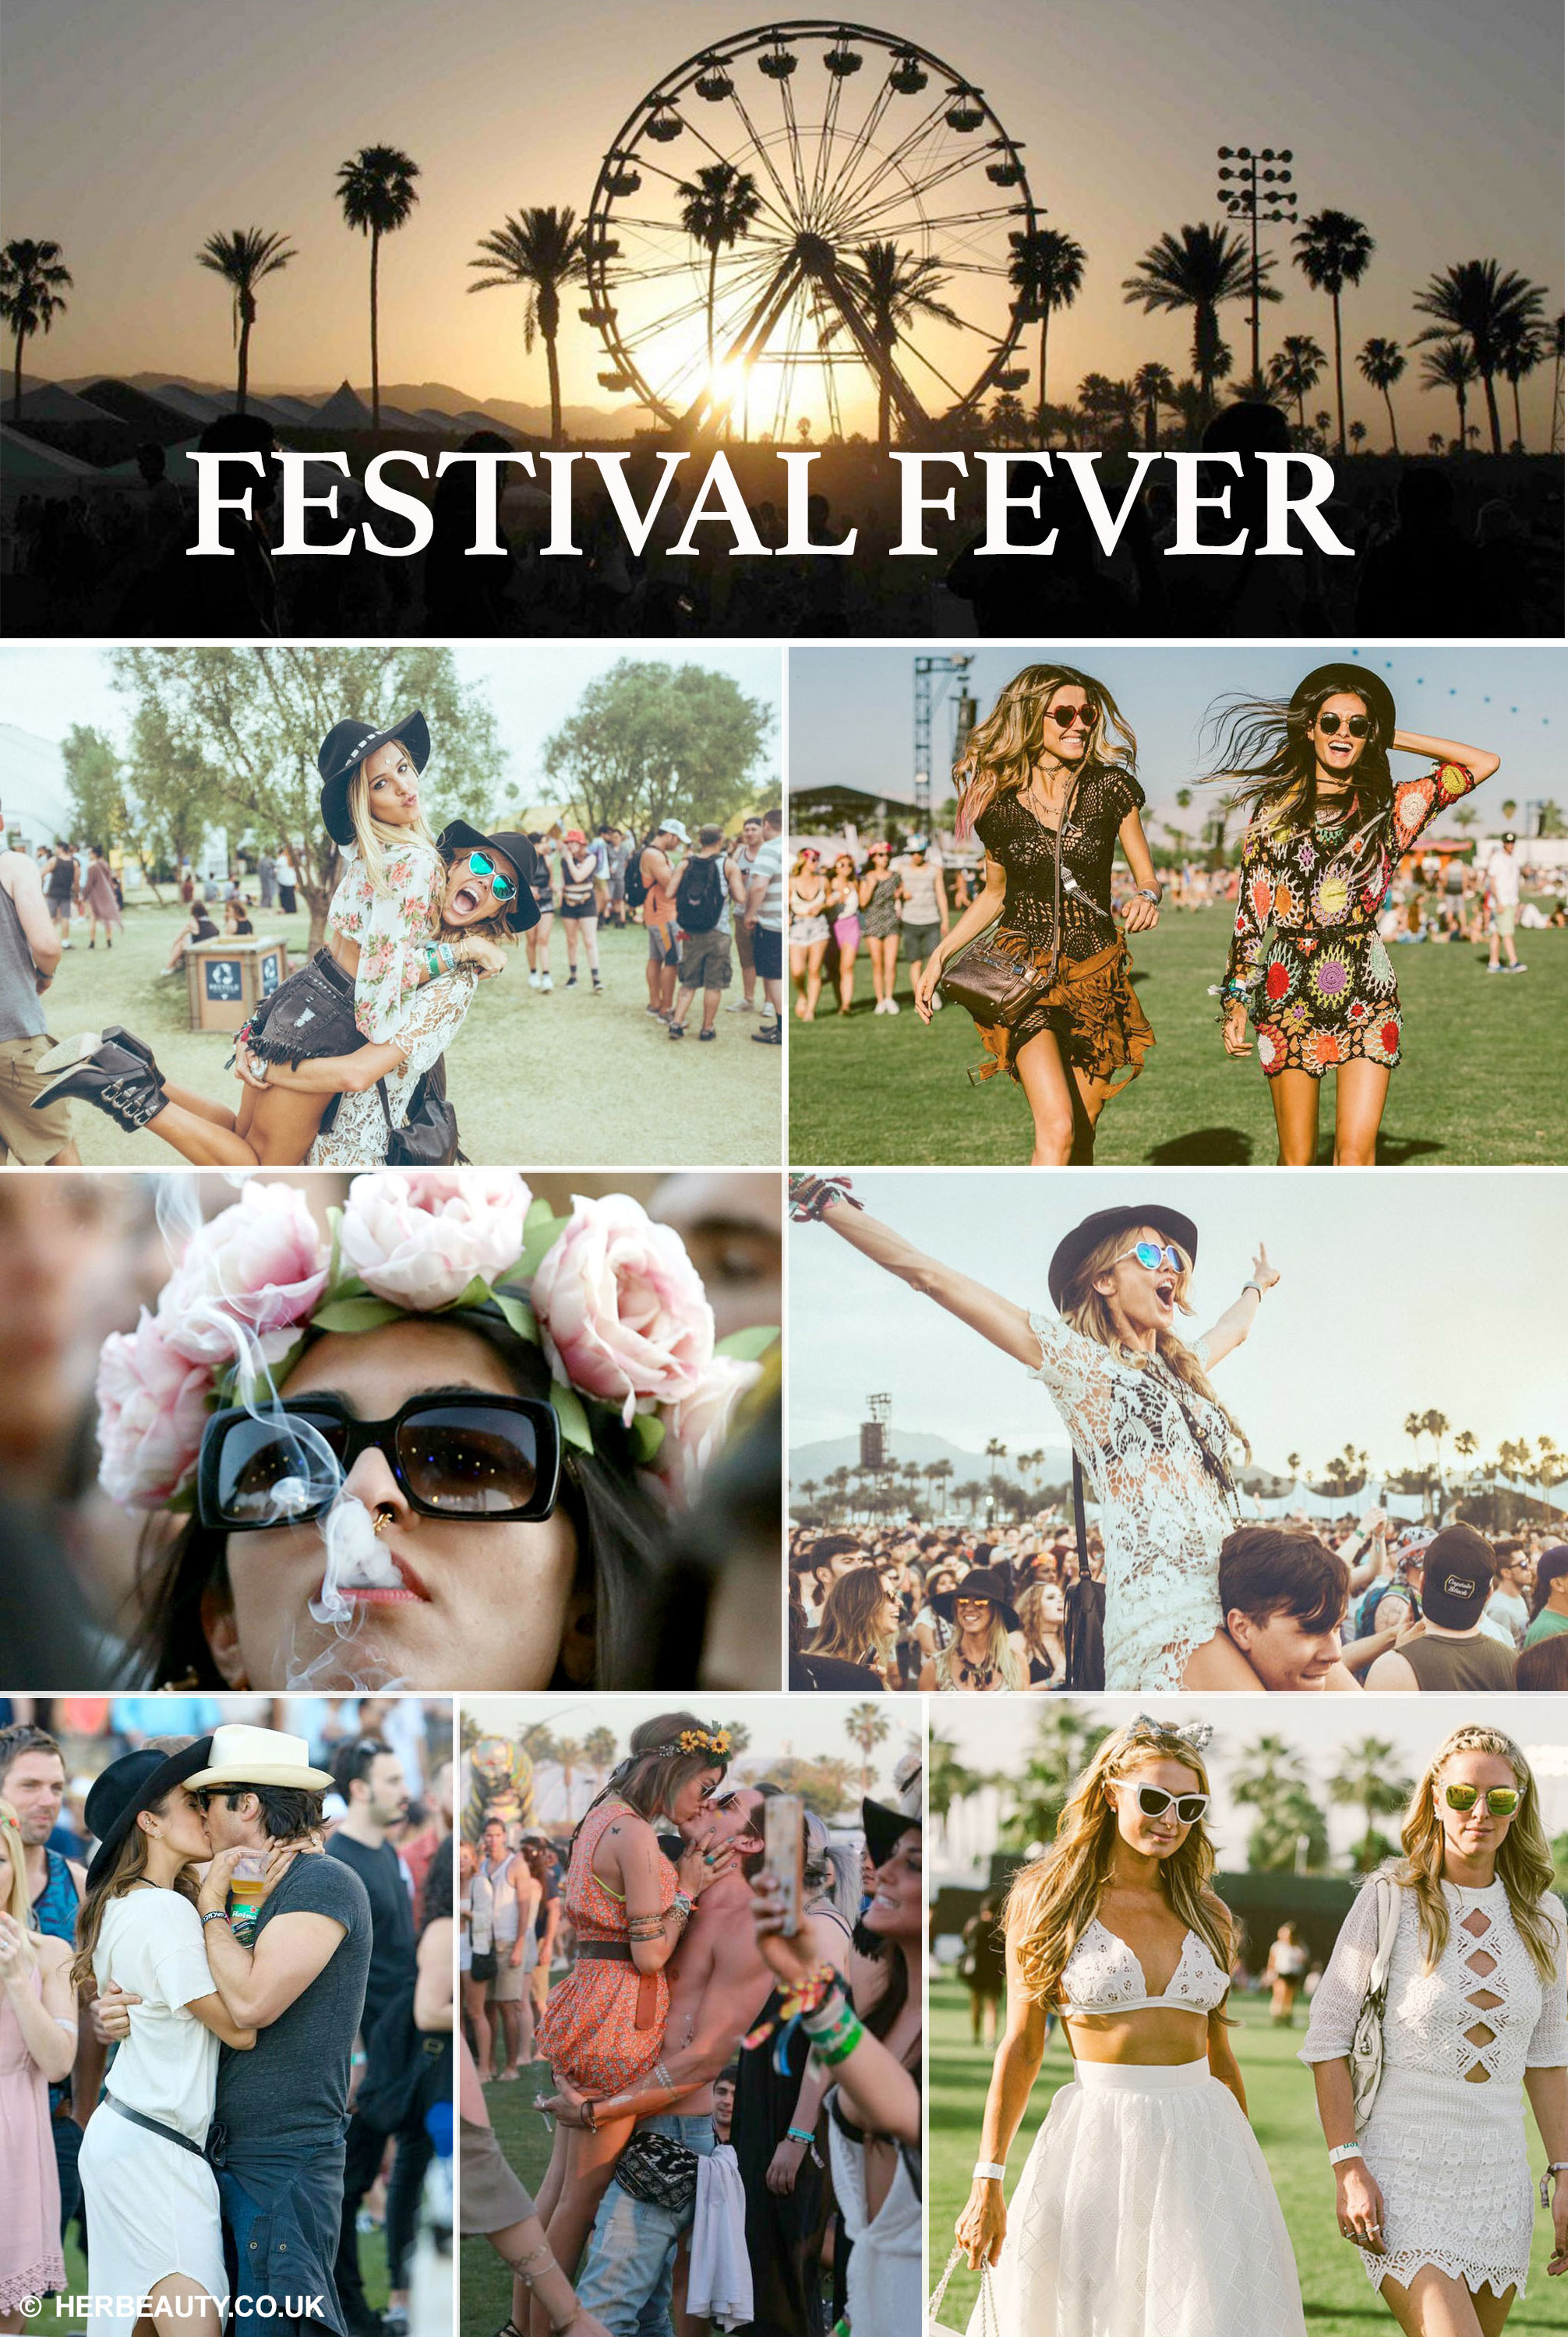 Festival Fever: Coachella